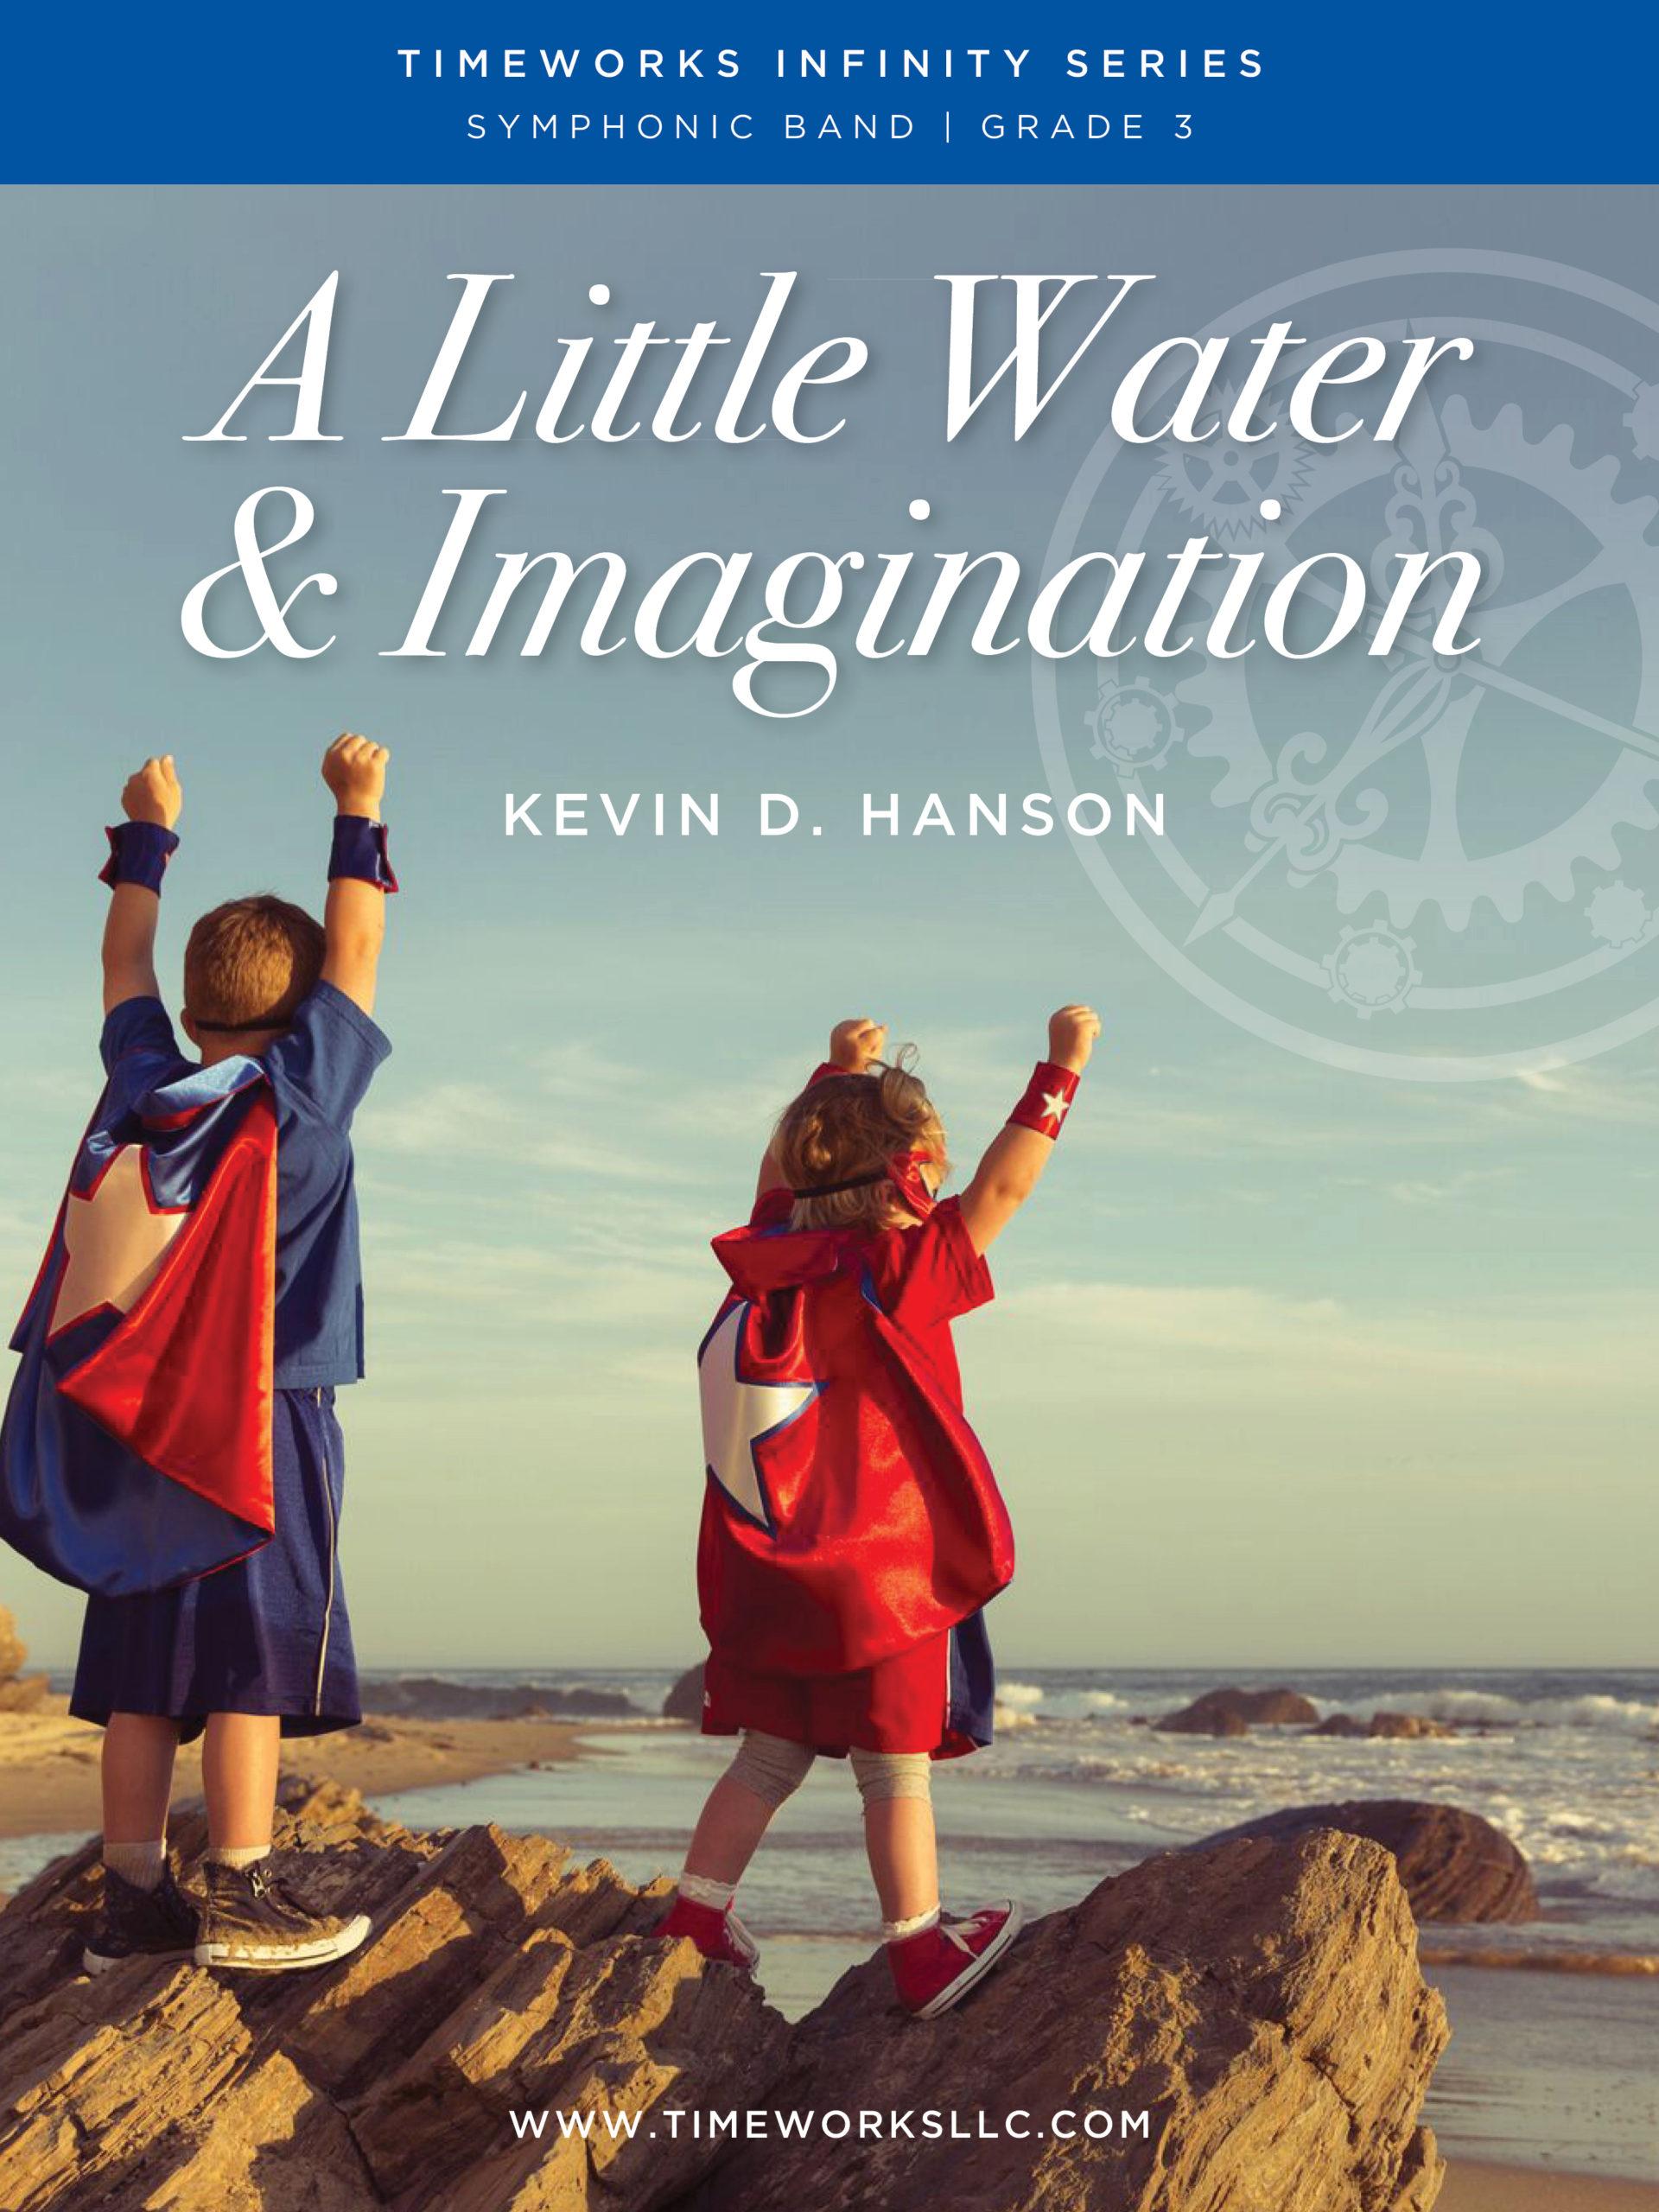 A Little Water & Imagination